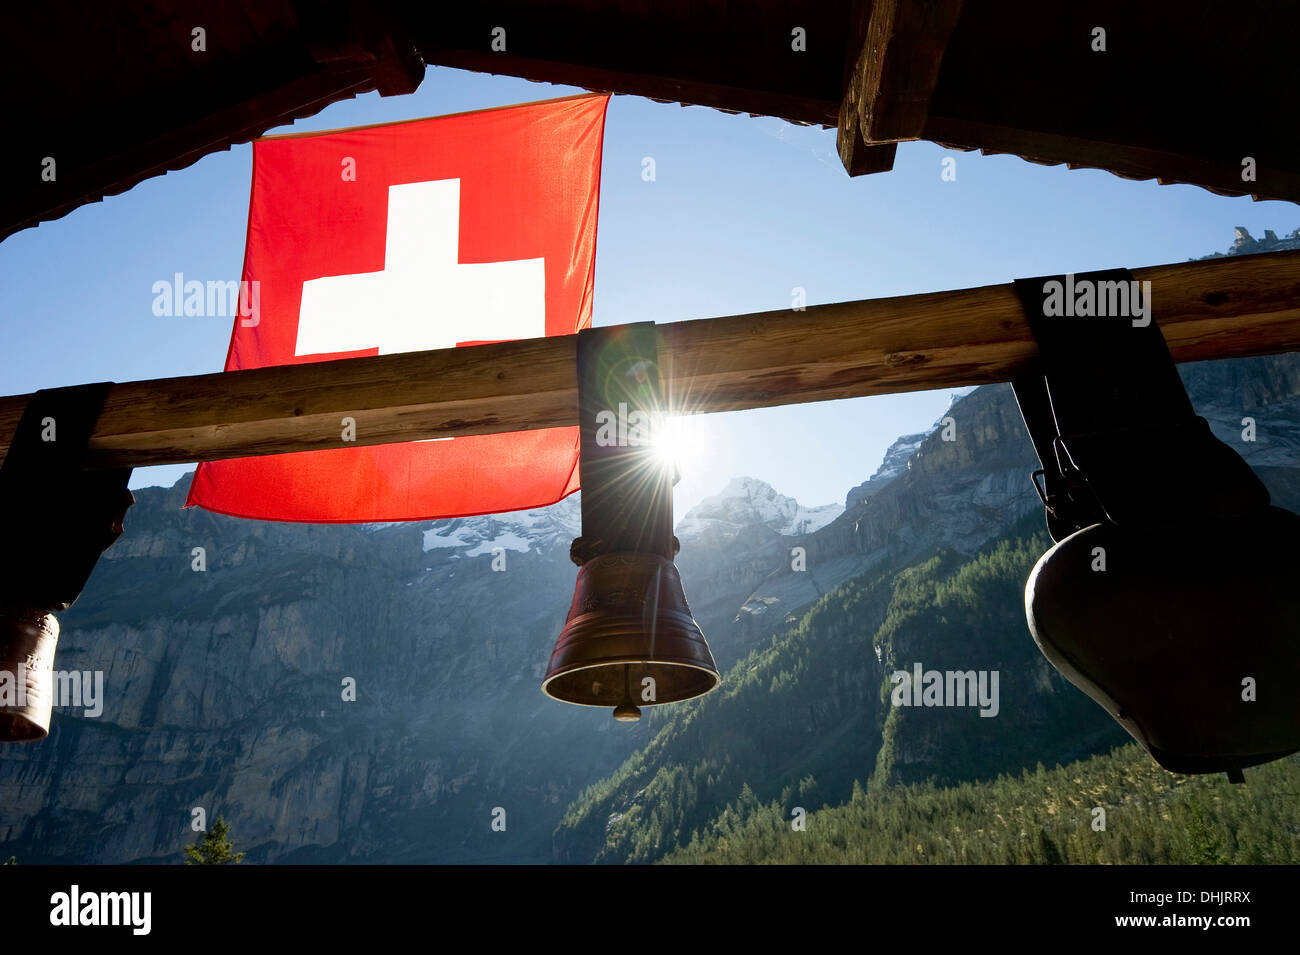 Swiss flag and cow bells at lake Oeschinensee, Kandersteg, Bernese Oberland, Canton of Bern, Switzerland, Europe - Stock Image